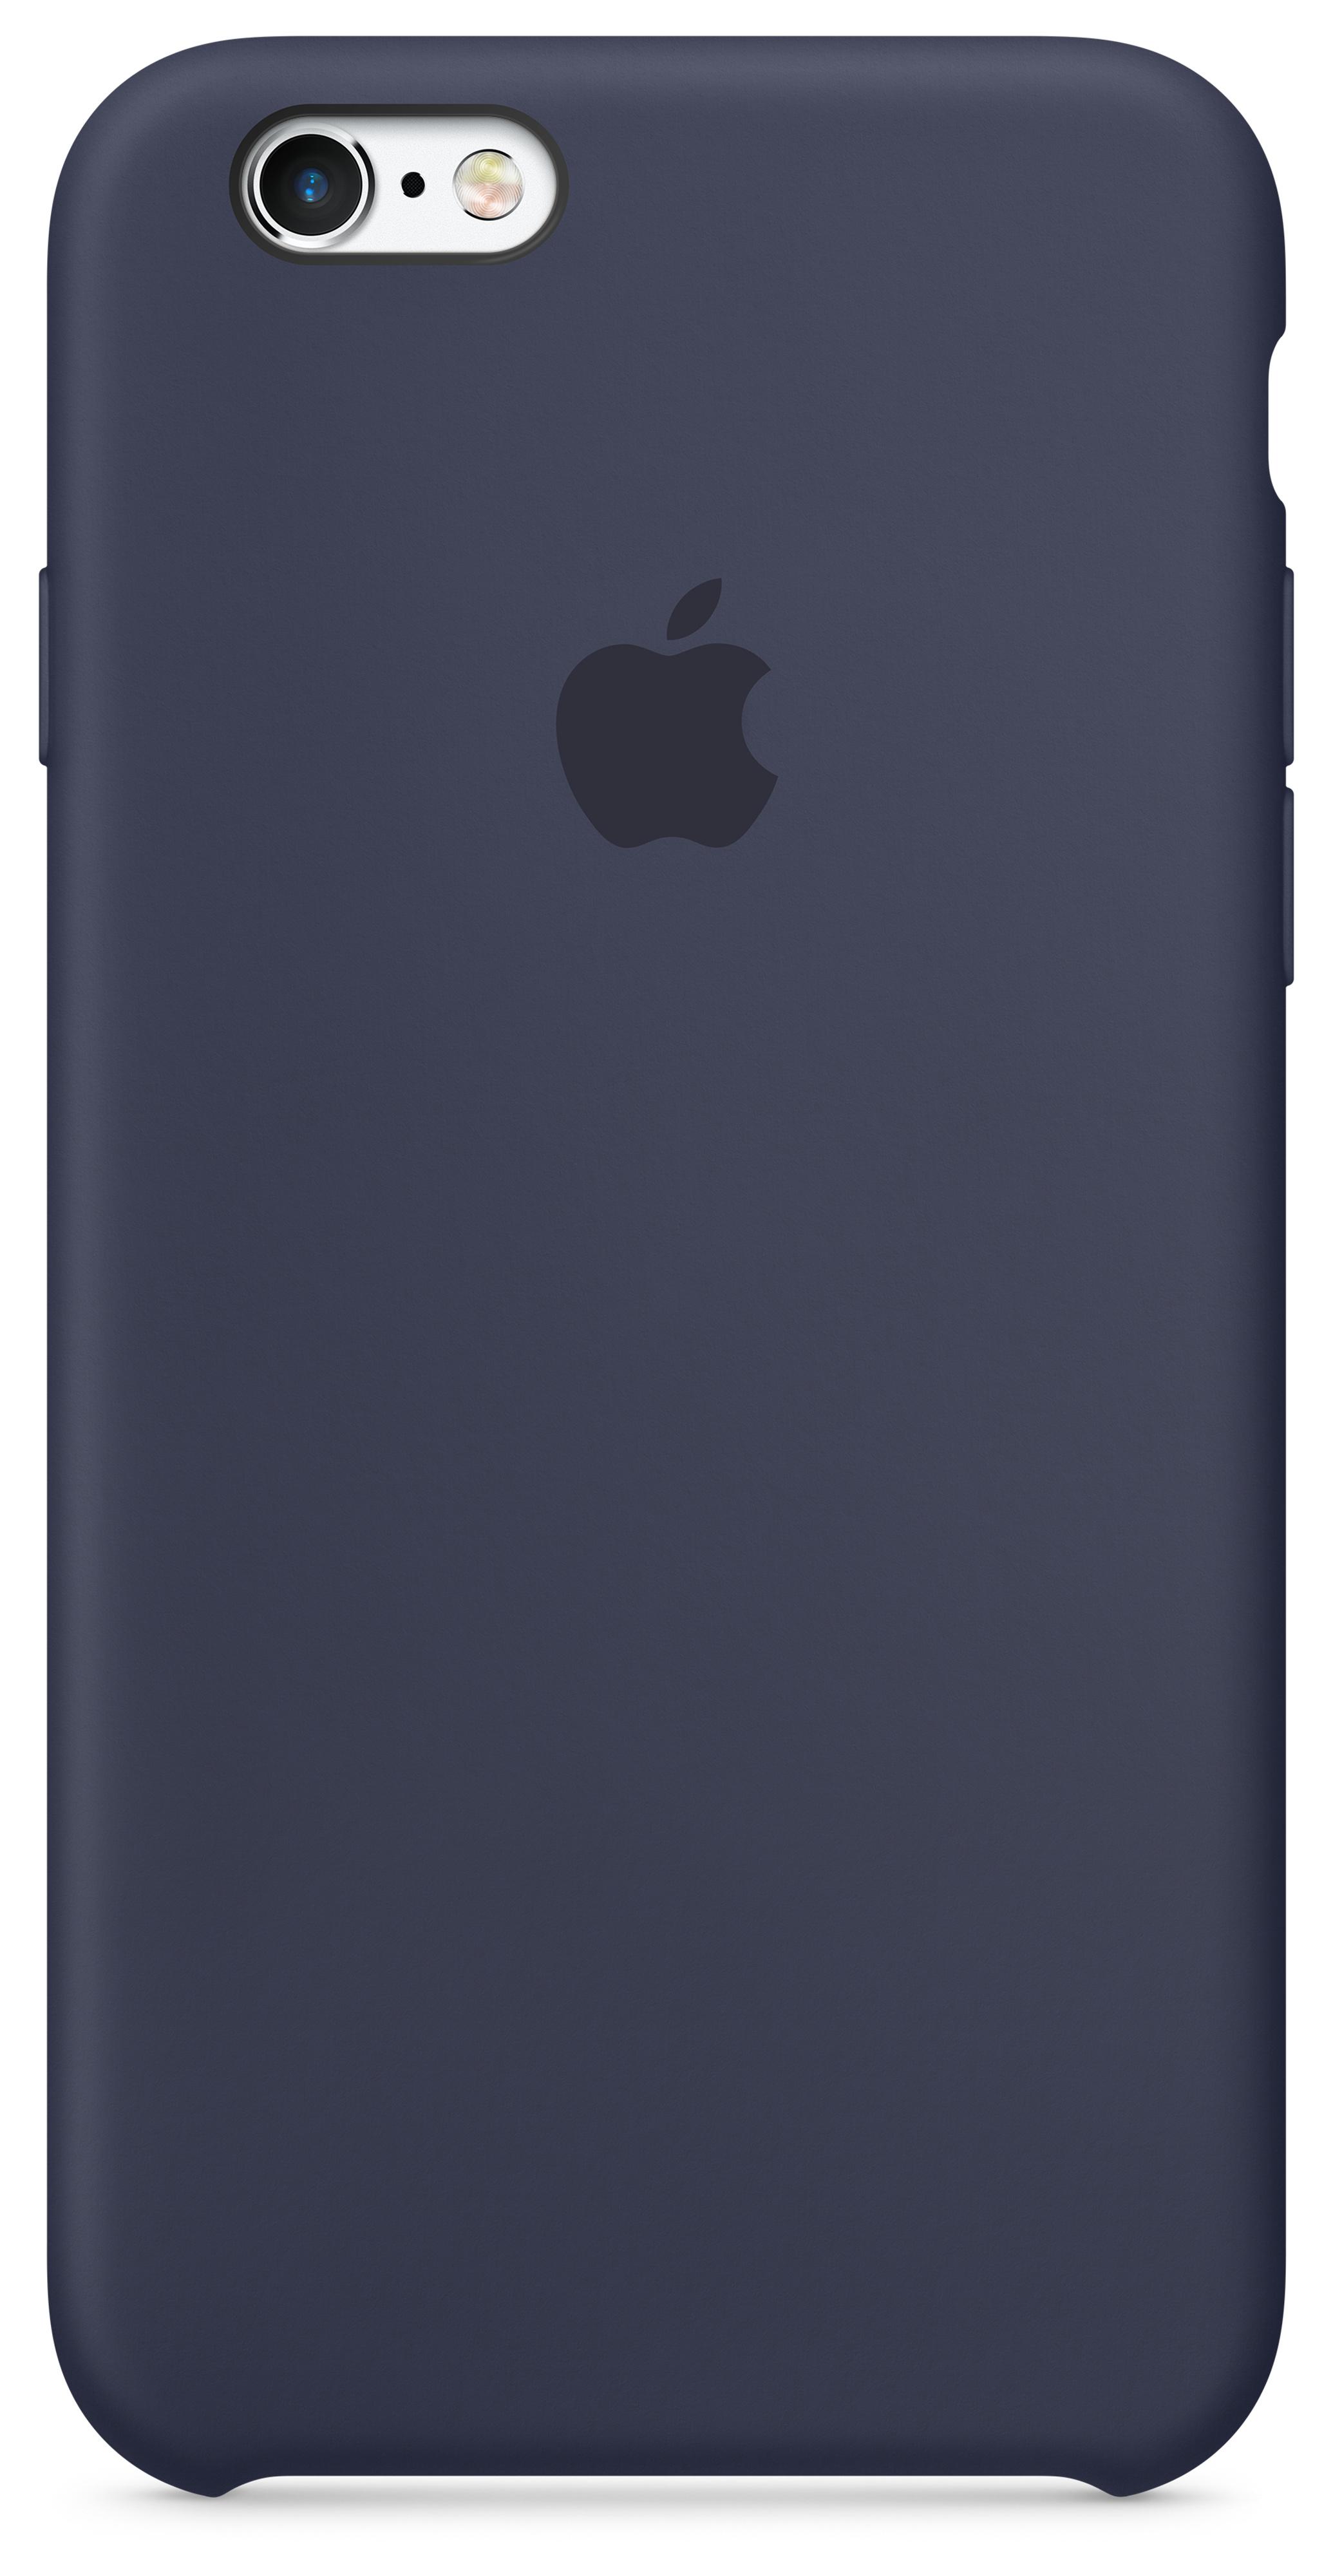 reputable site 0d9c5 223c4 iPhone 6 / 6s Silicone Case - Midnight Blue